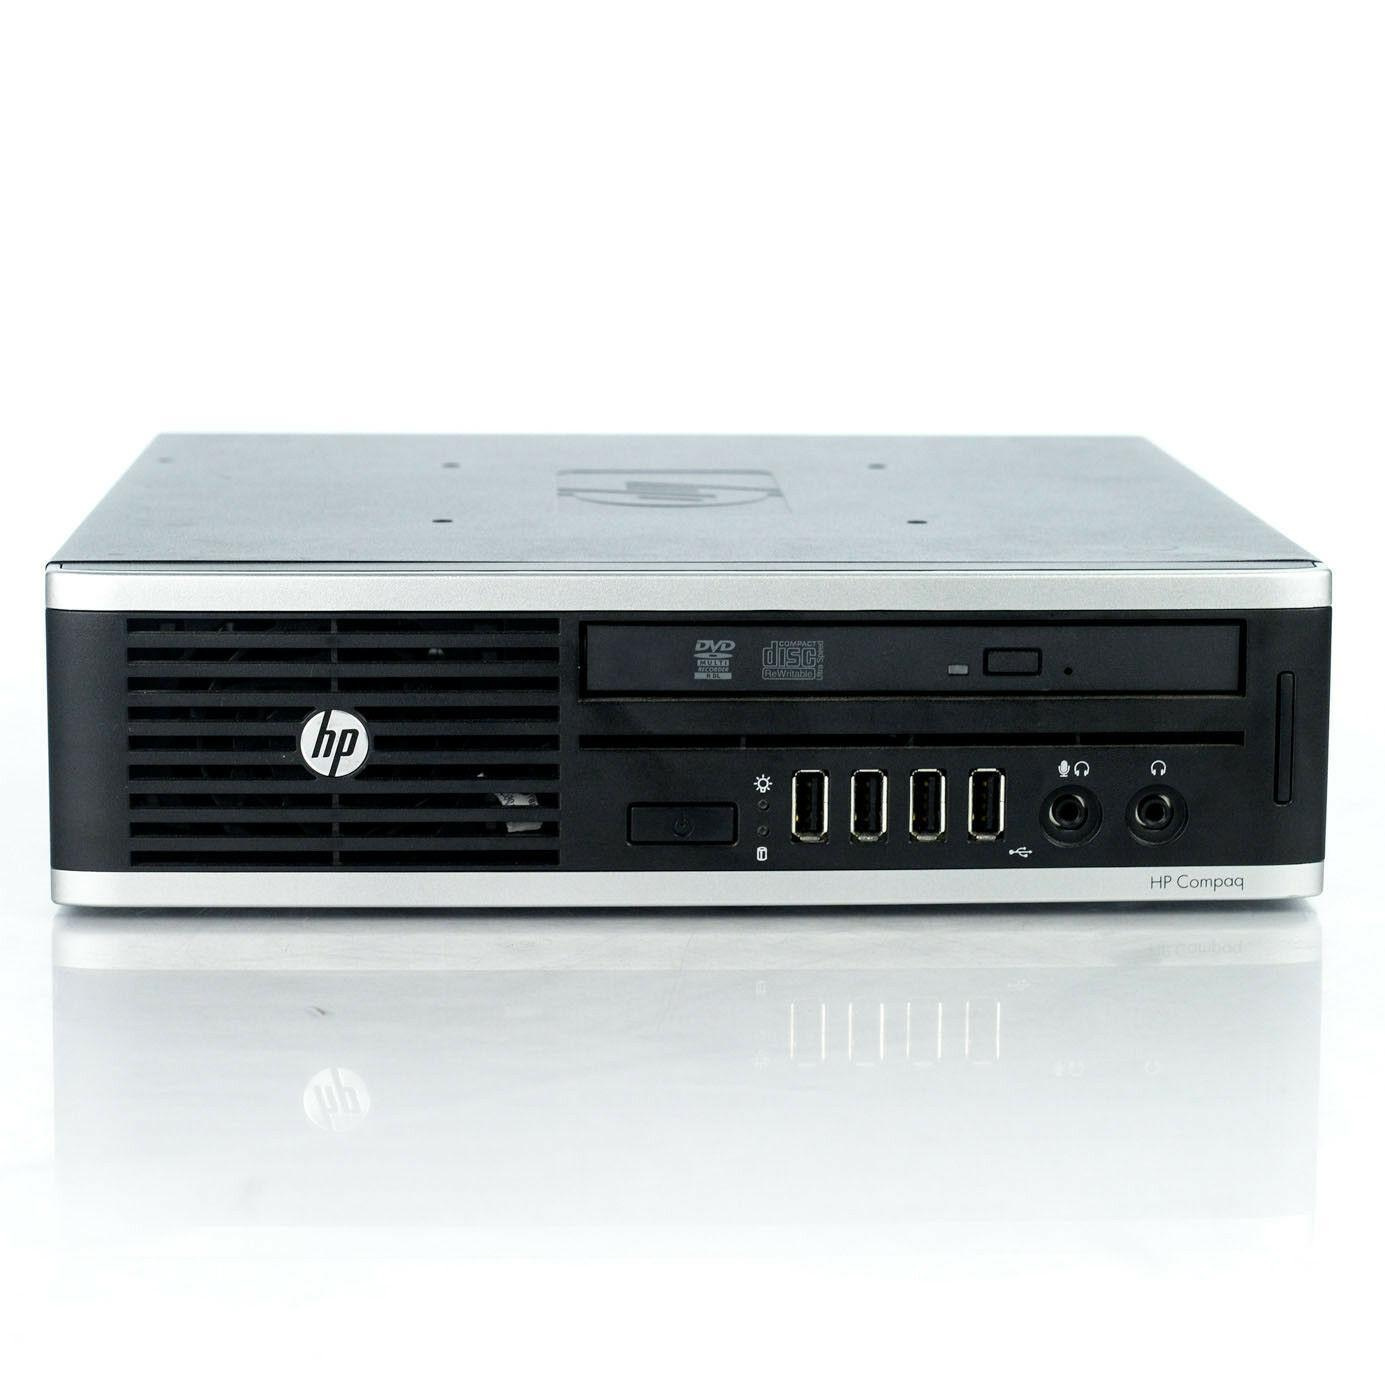 Hp Compaq Elite 8300 USFF Core i5 2.9 GHz - HDD 240 GB RAM 8GB